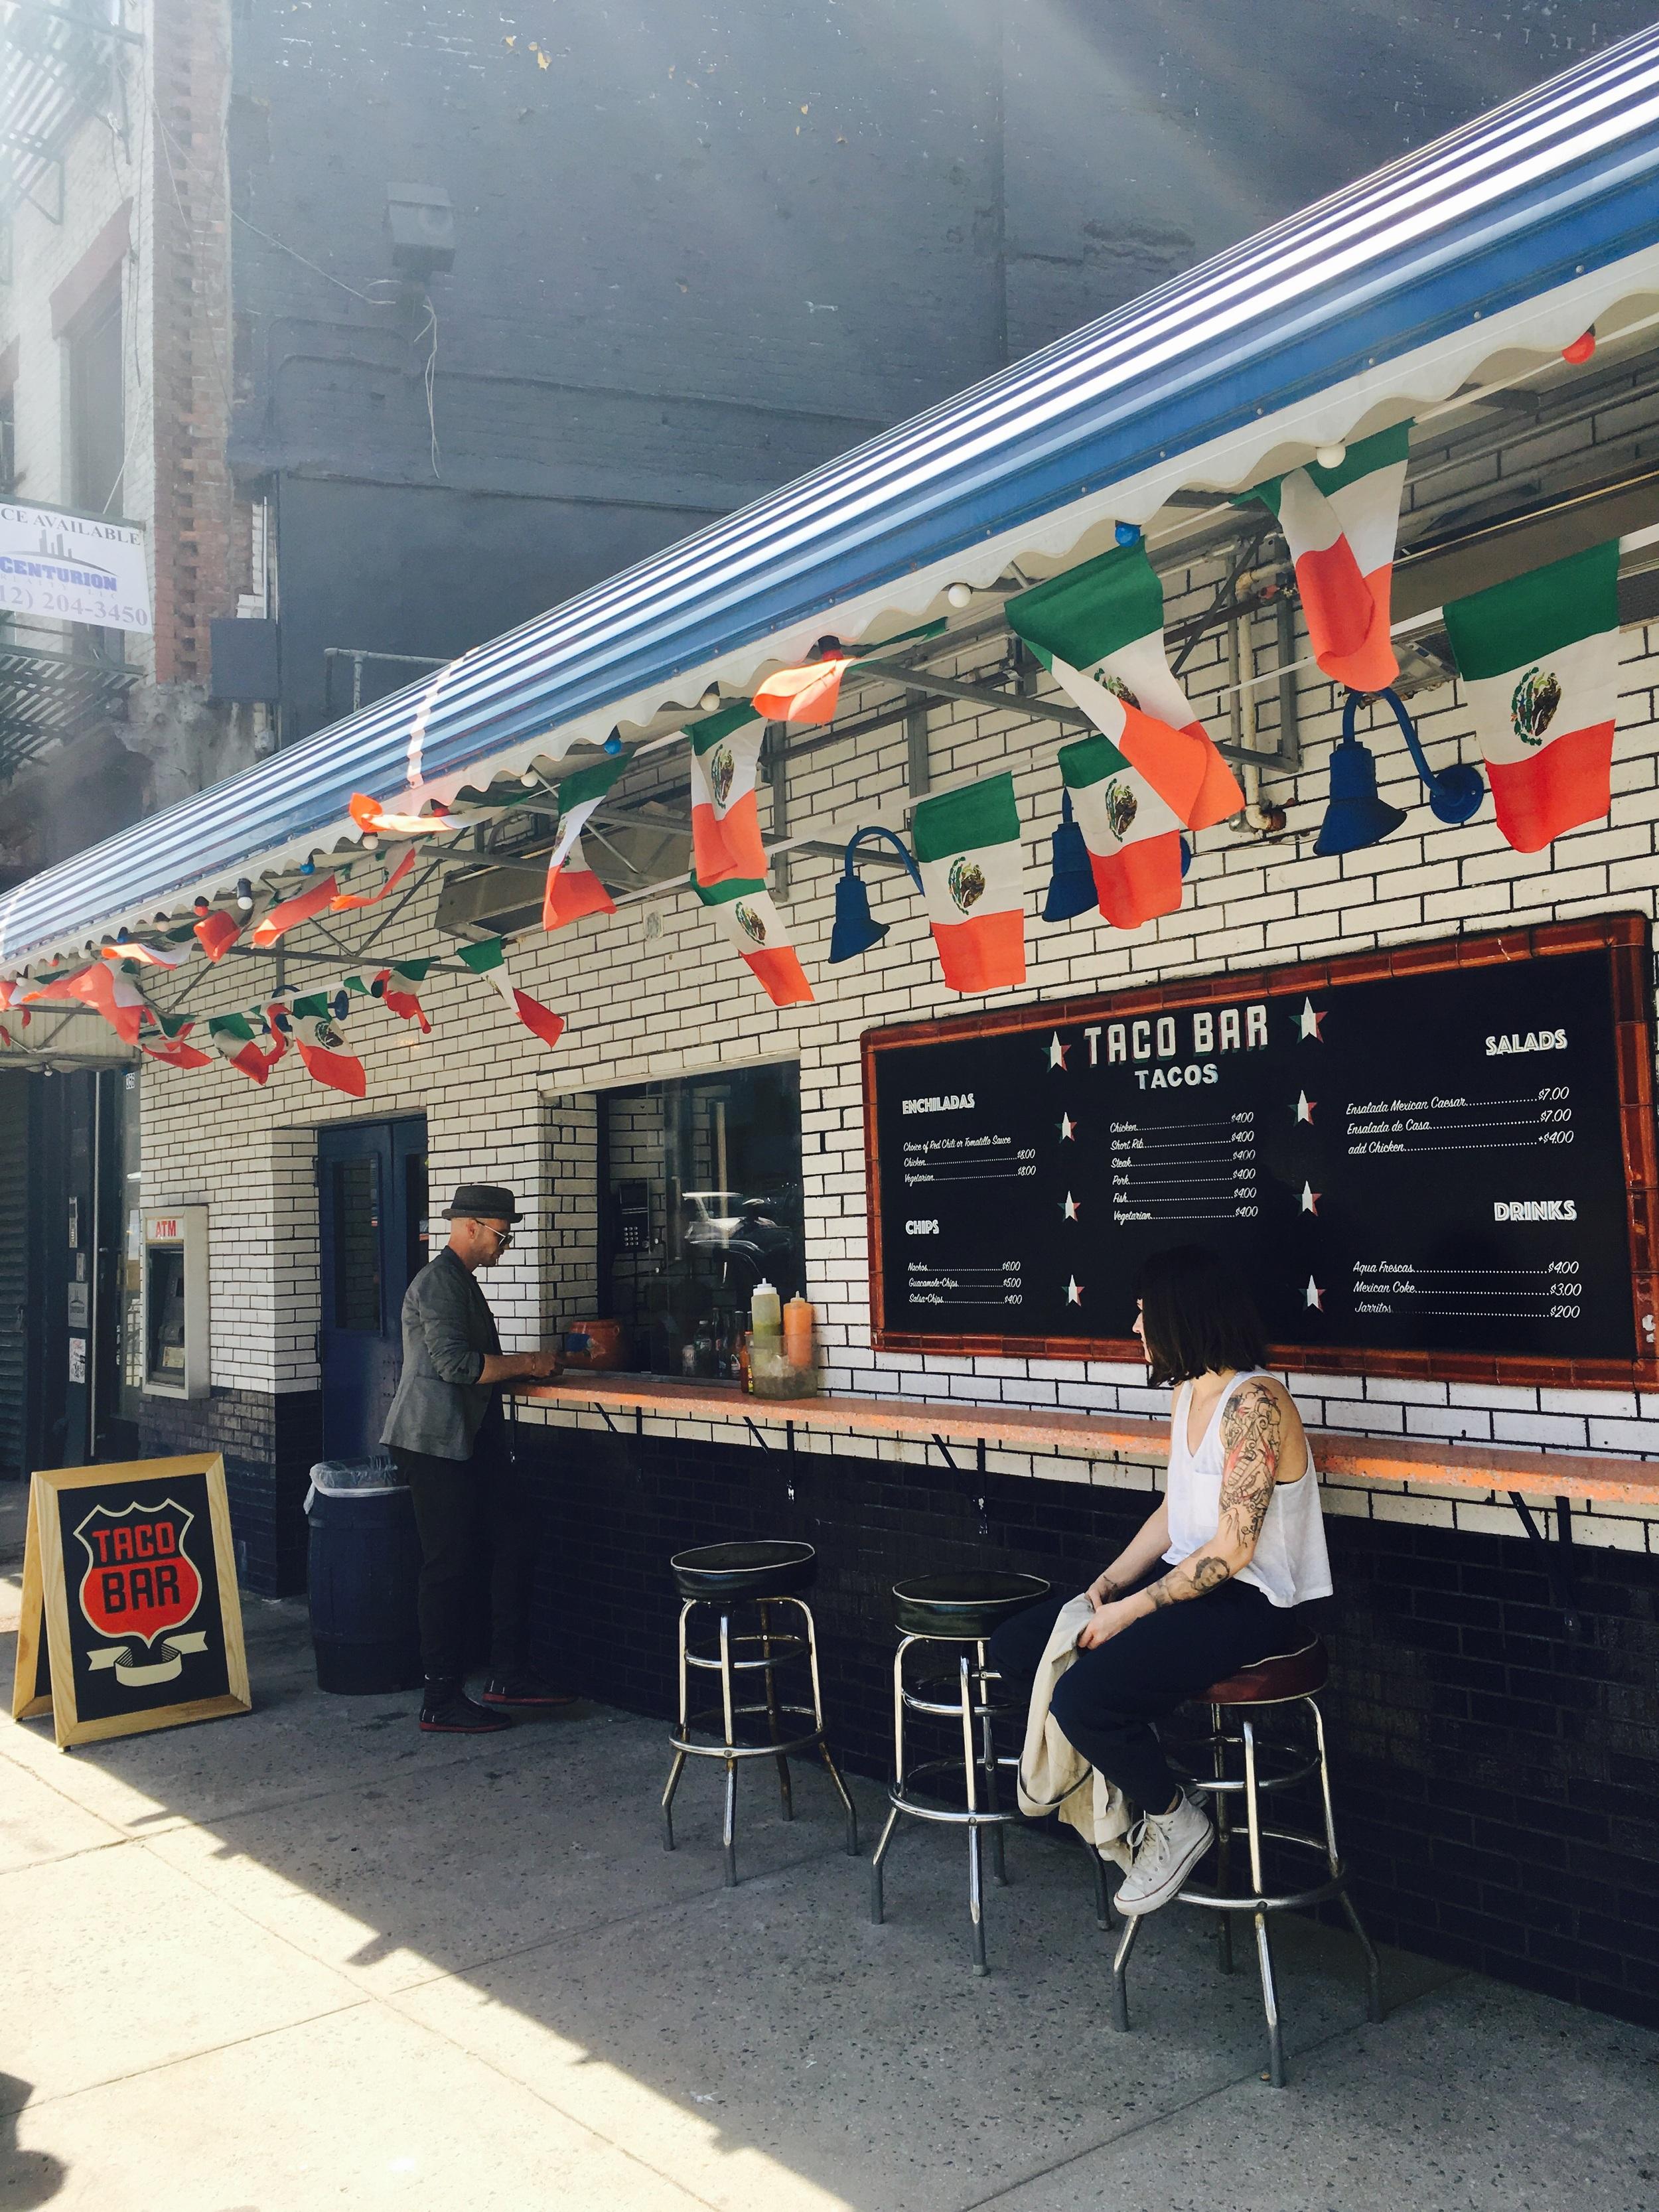 The Taco patio at B Bar Café. Bowery.